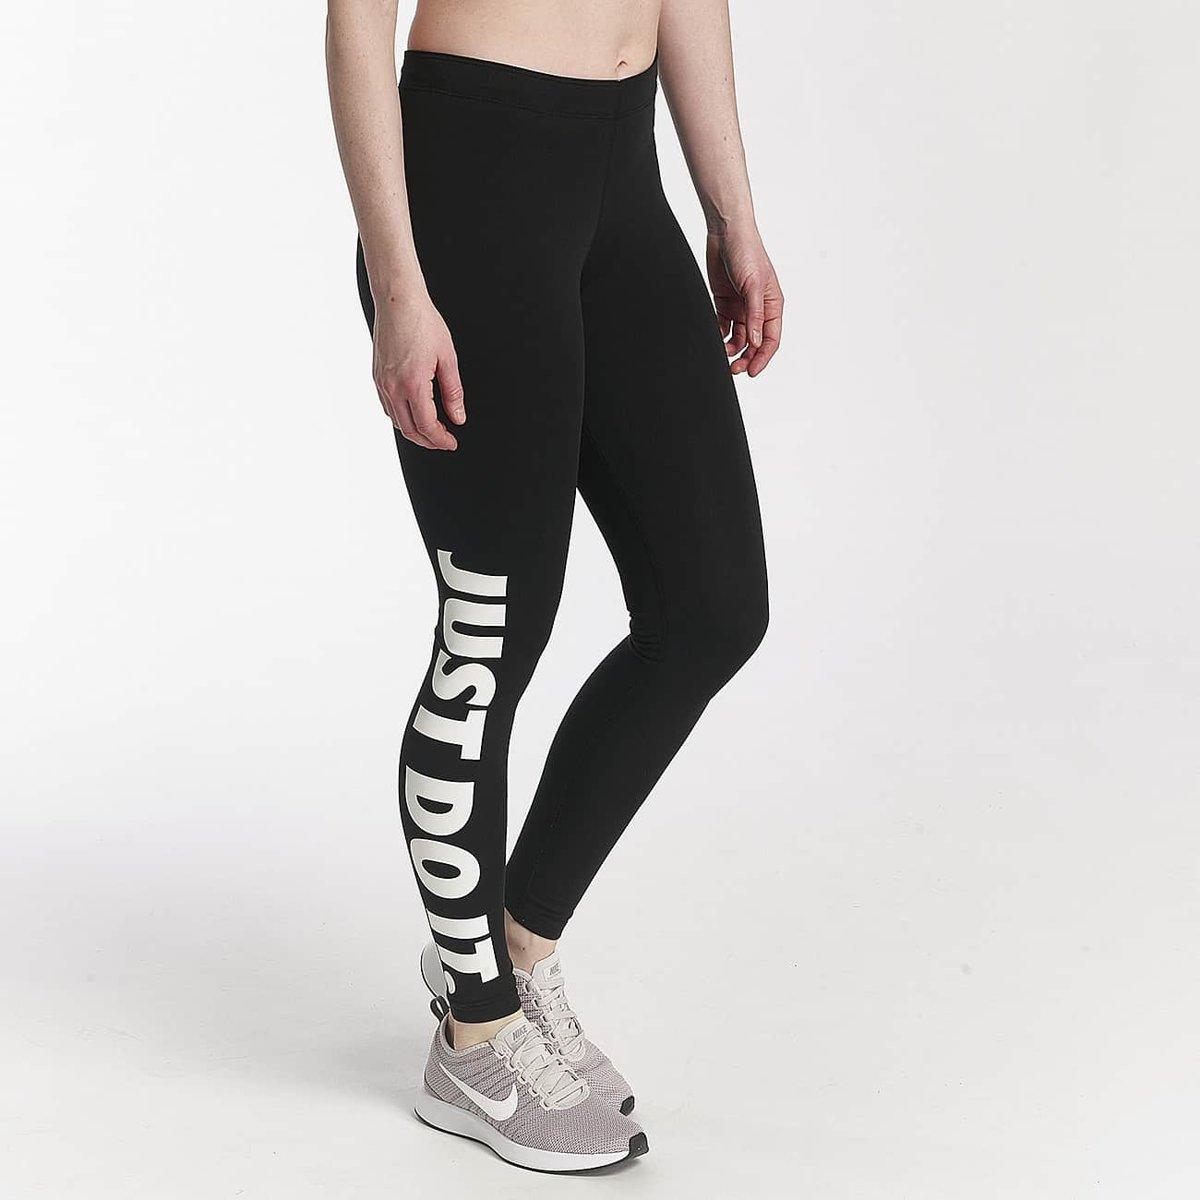 Nike Legasee JDI Sportlegging Dames Black(White)